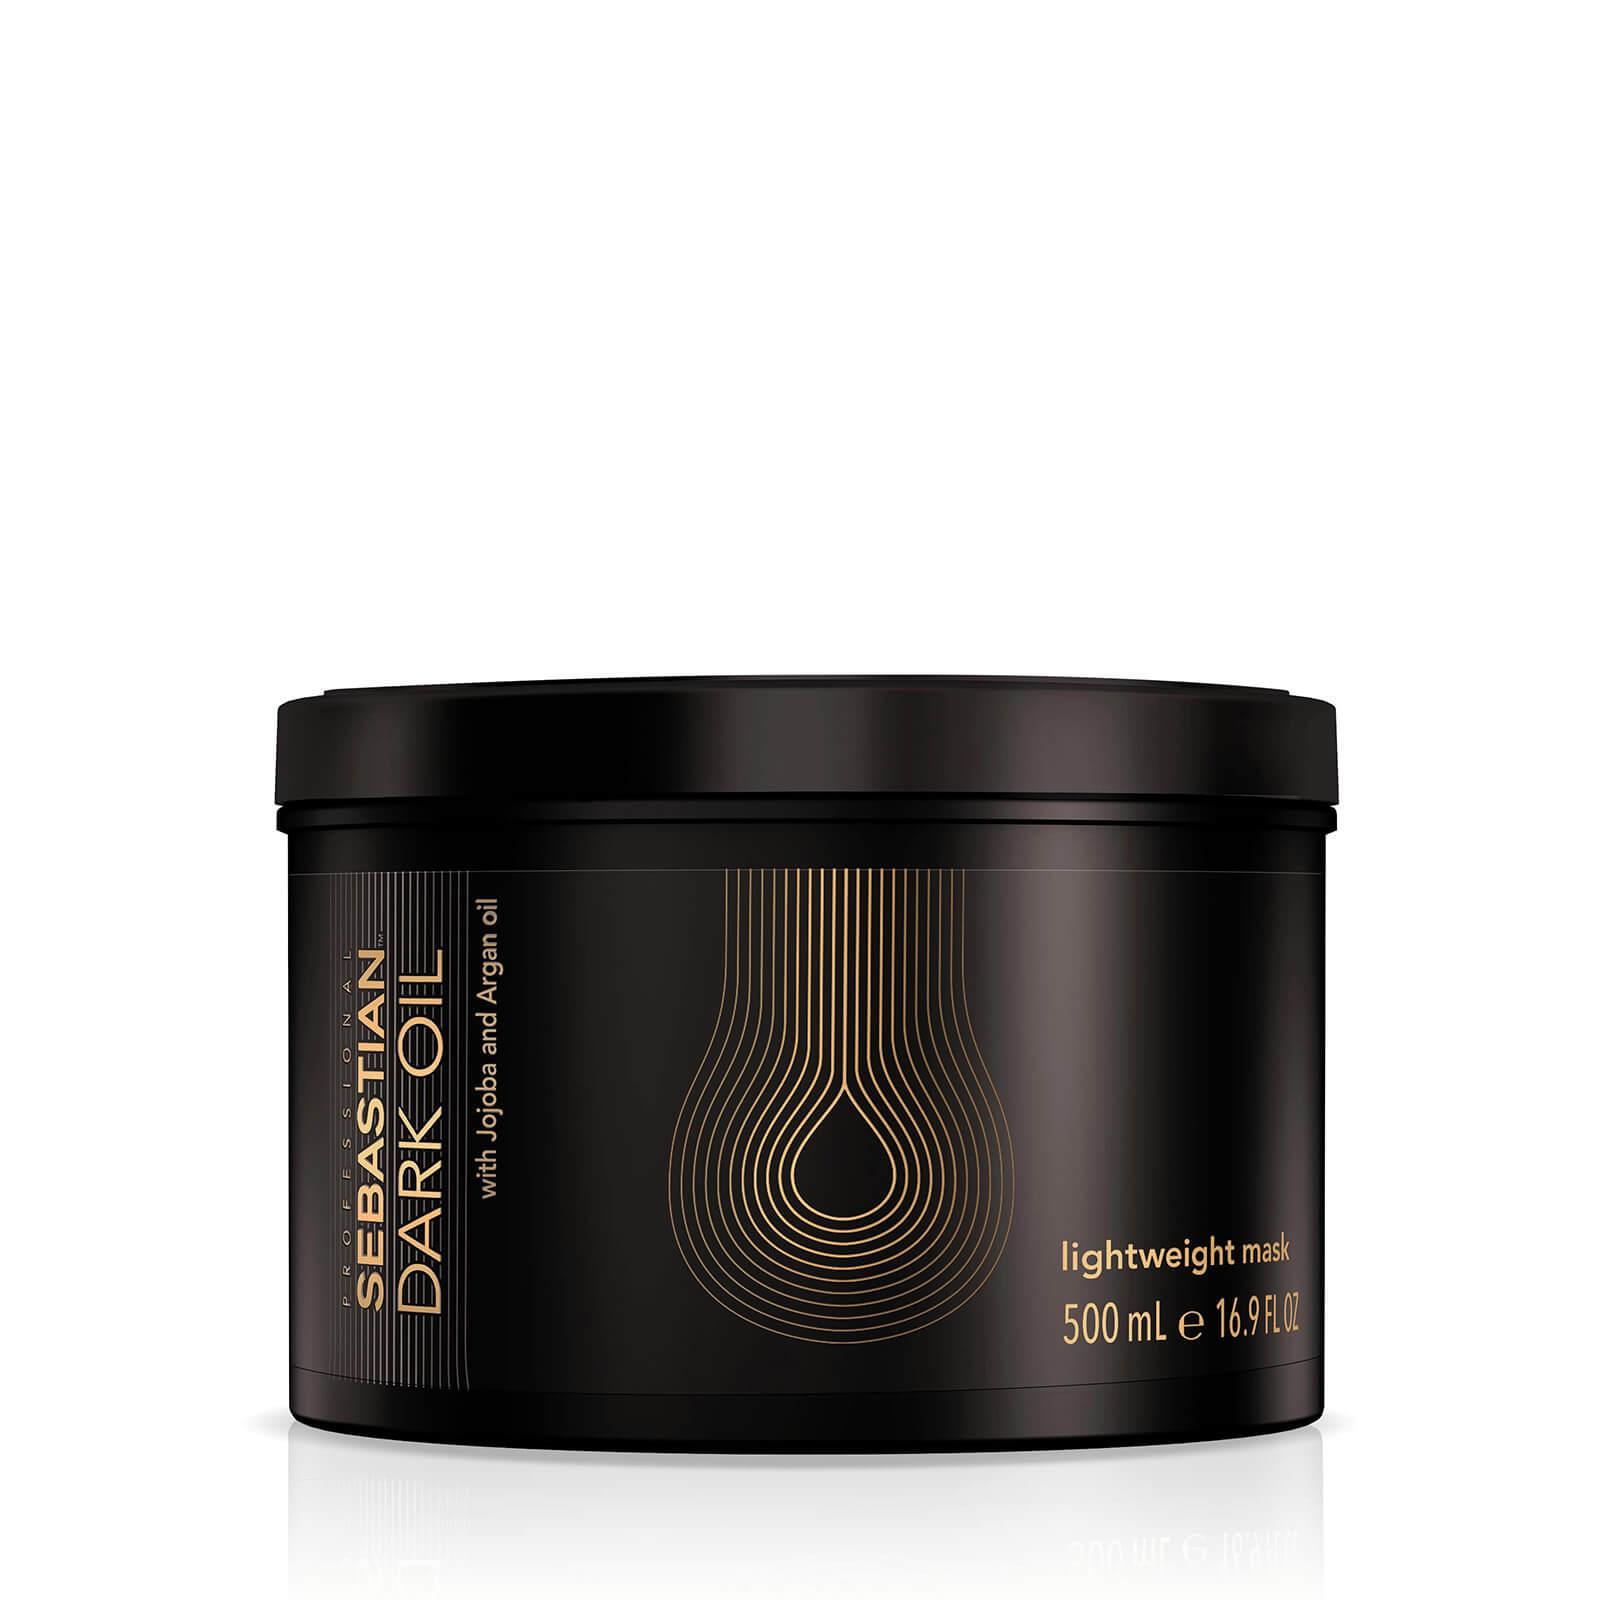 Sebastian Professional Dark Oil Lightweight Mask 500ml  - Купить